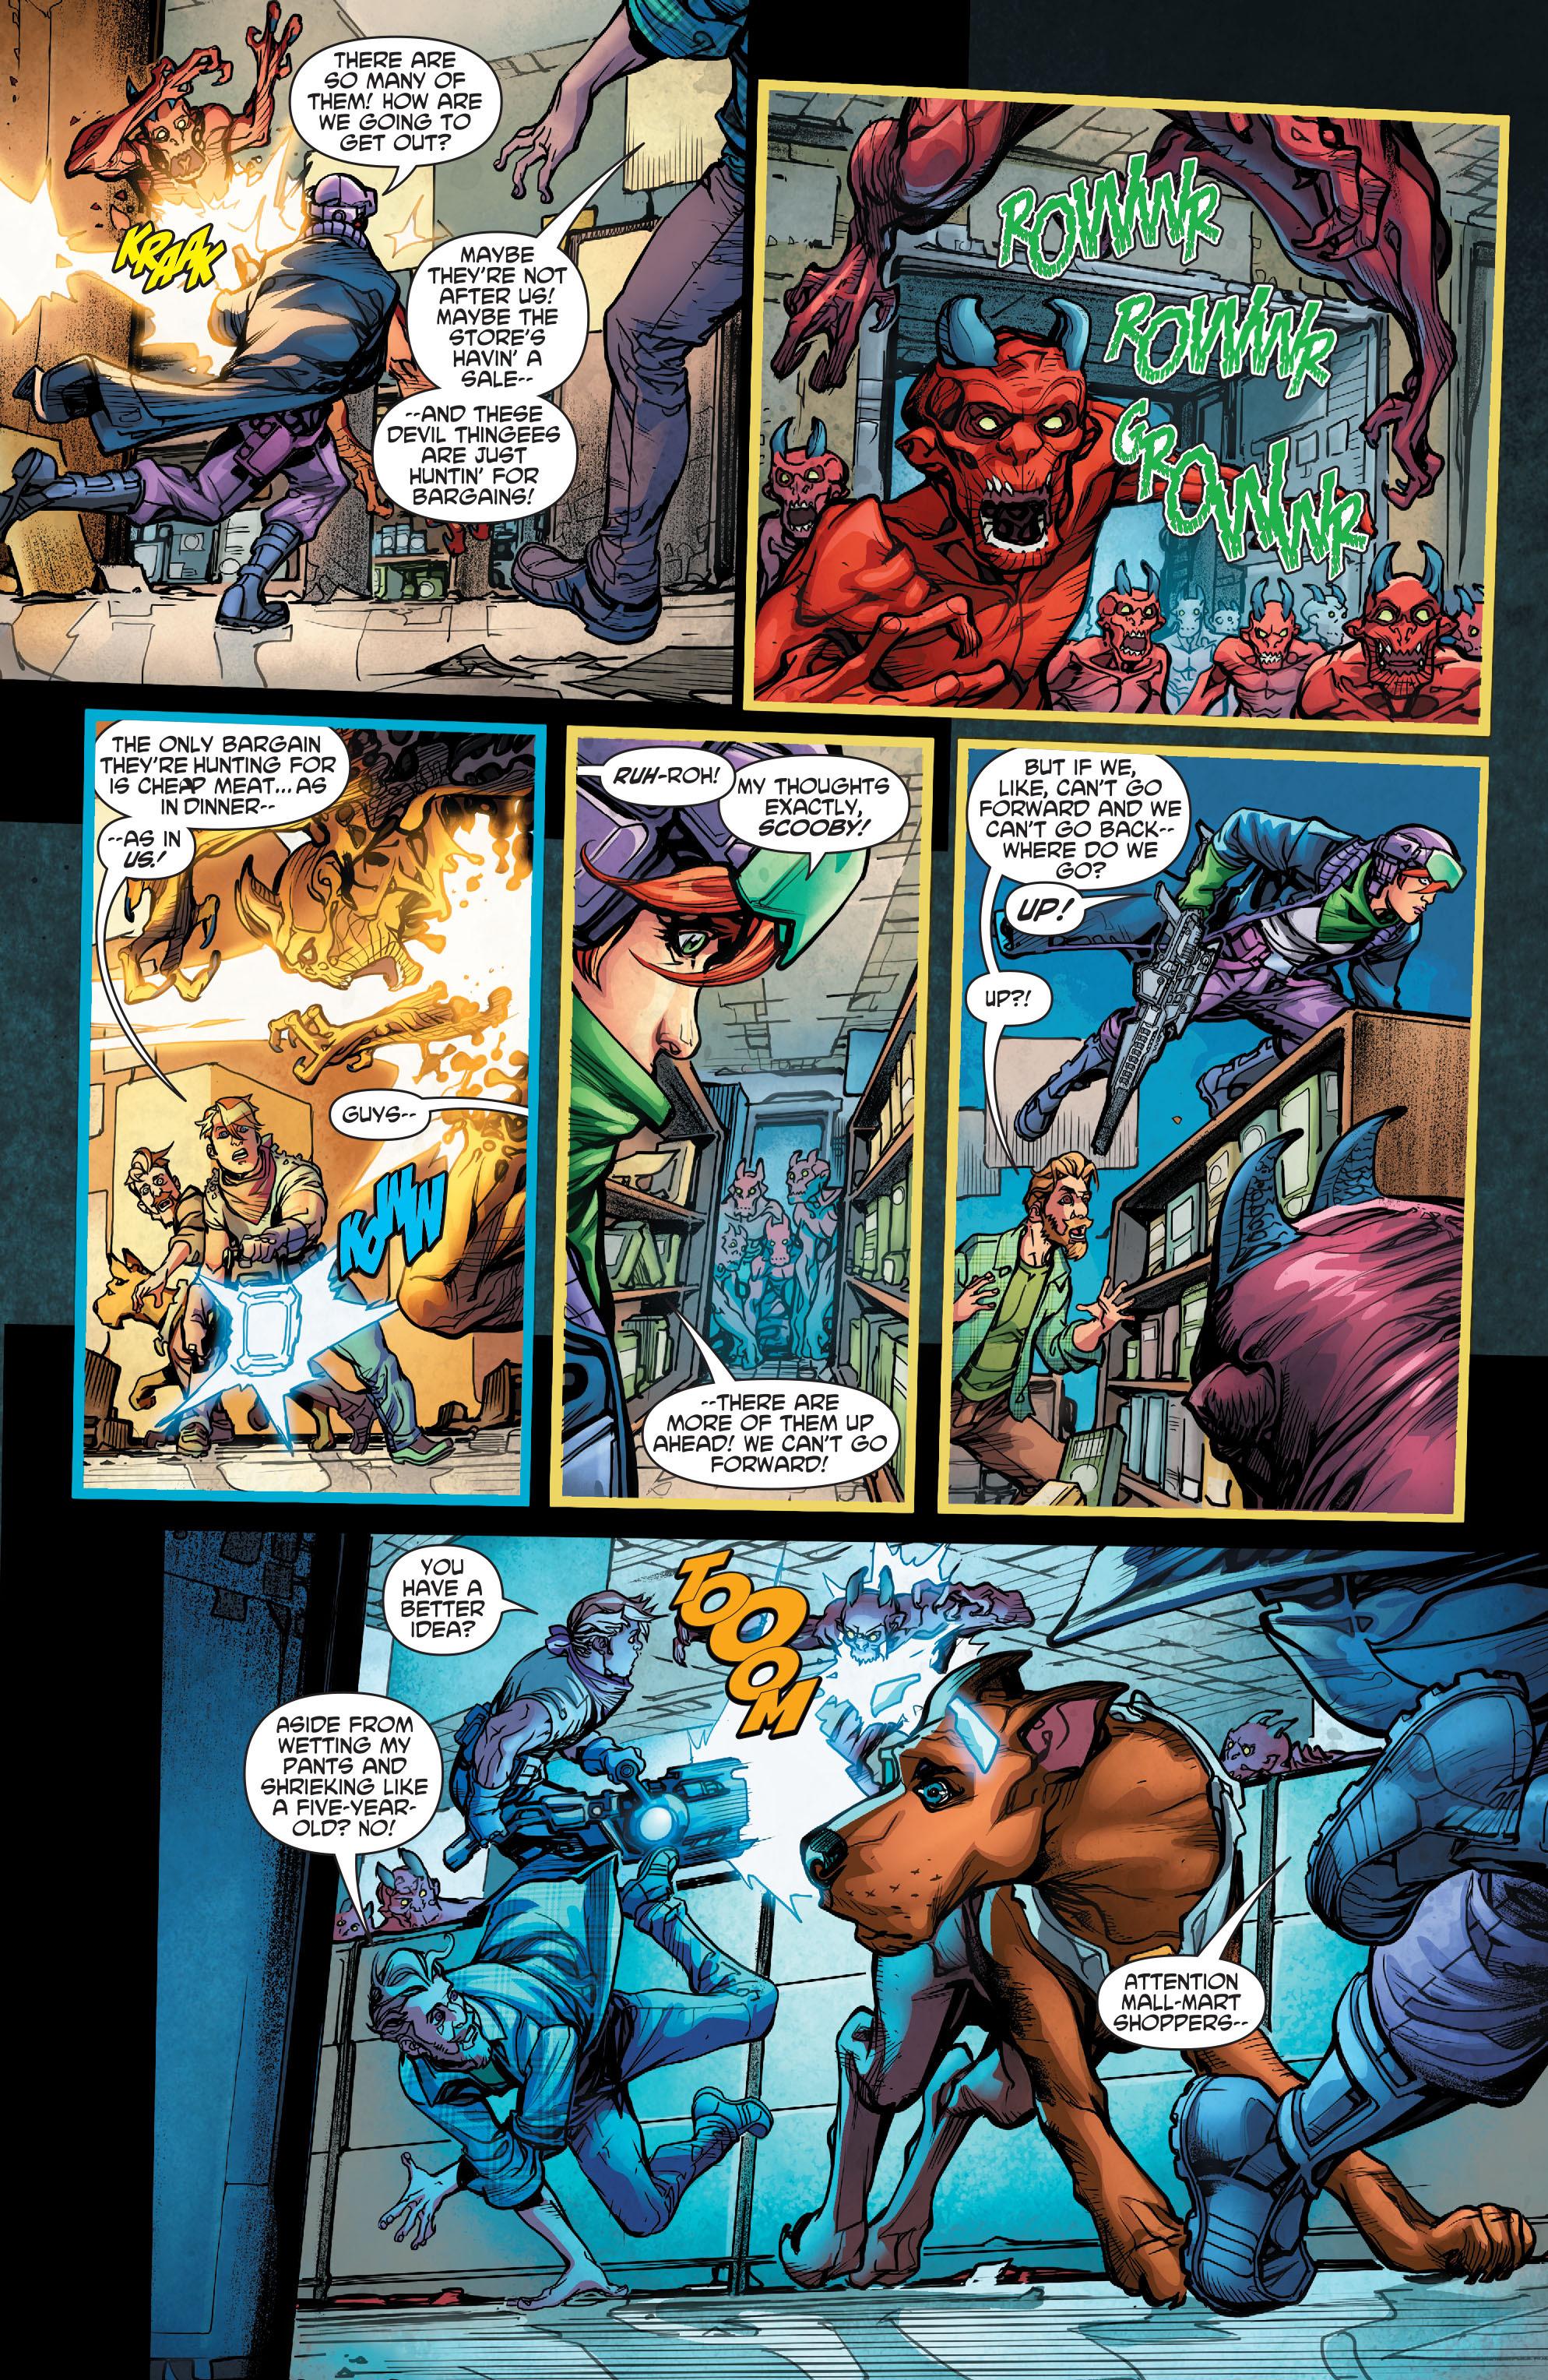 Read online Scooby Apocalypse comic -  Issue #5 - 8